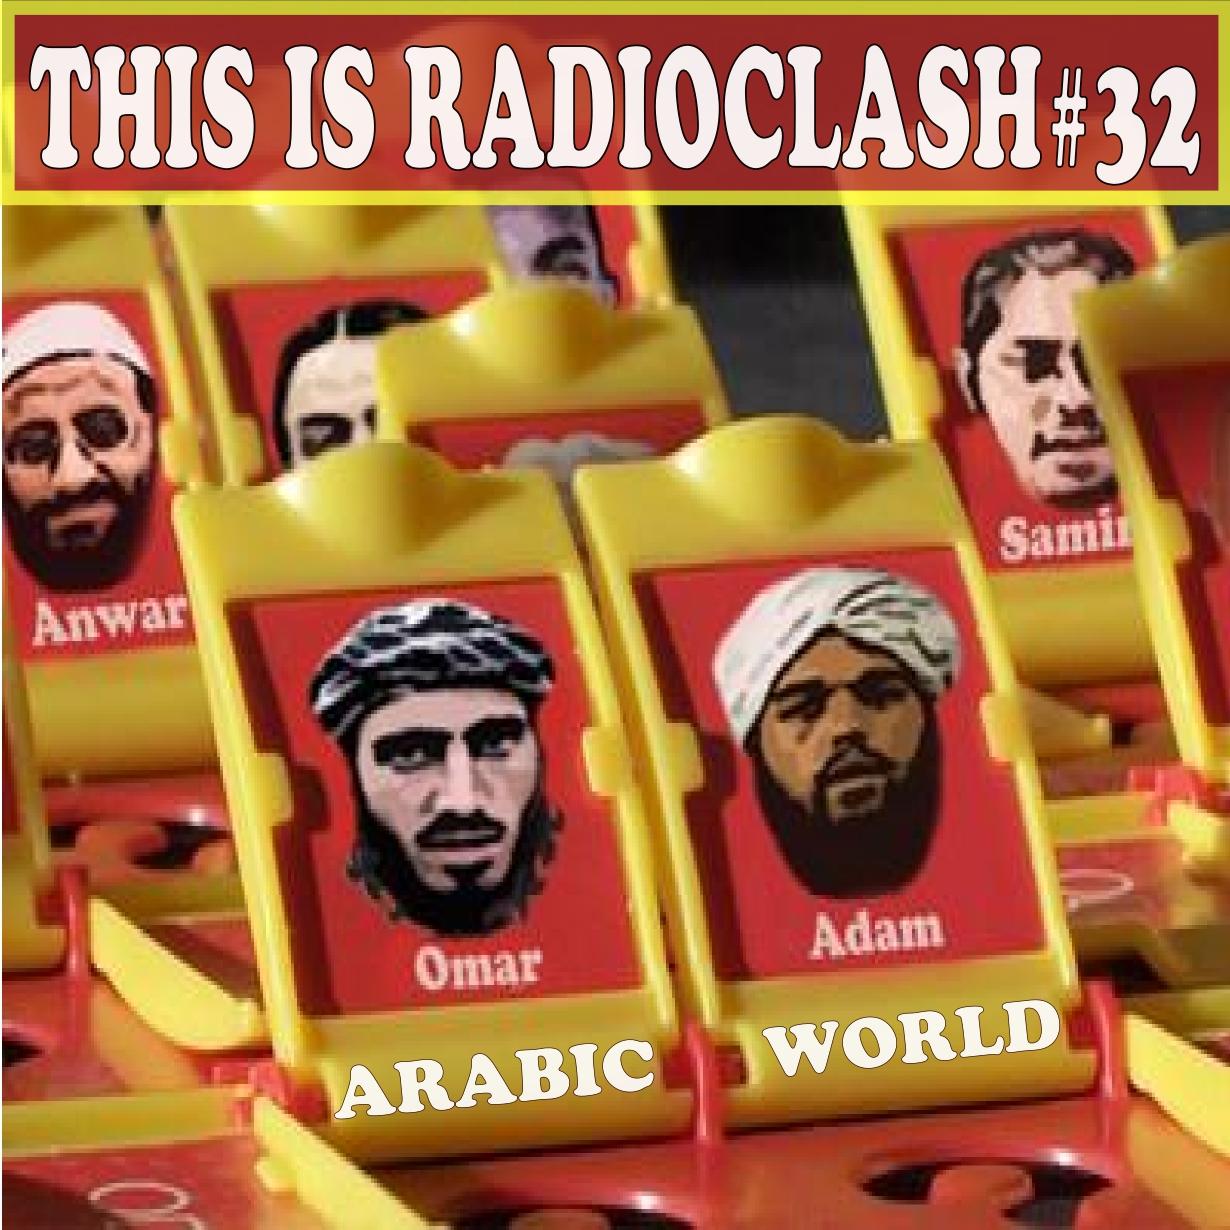 This Is Radioclash Jam Tangan Qampampq Vr 42 Rubber Oranye Original Thisisradioclash032 Arabic World